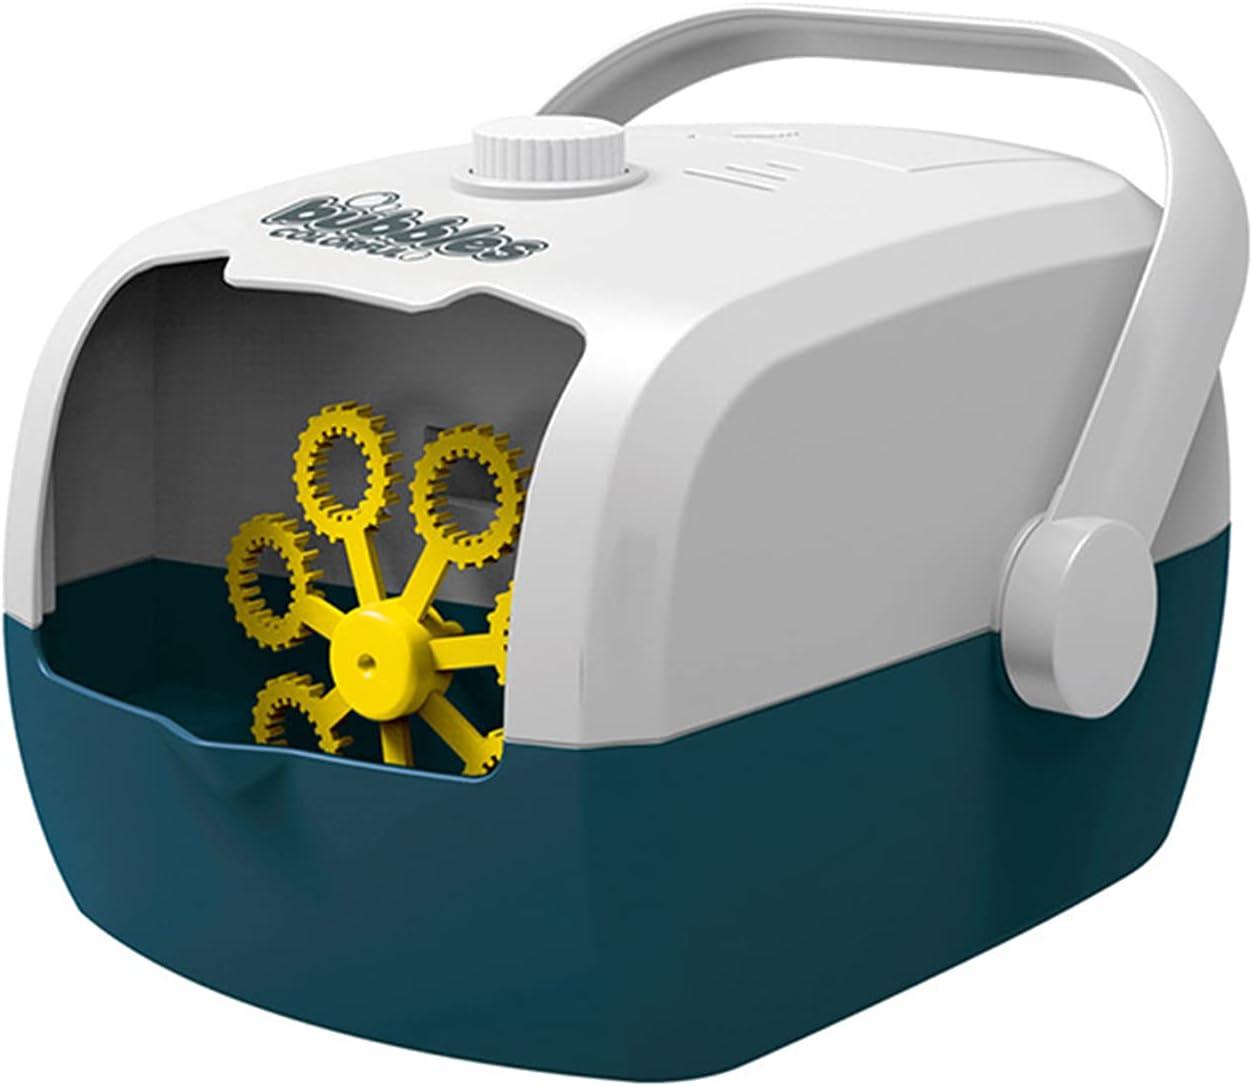 Bubble Machine,USB Automatic Bubble Blower with Bubble Water Ref